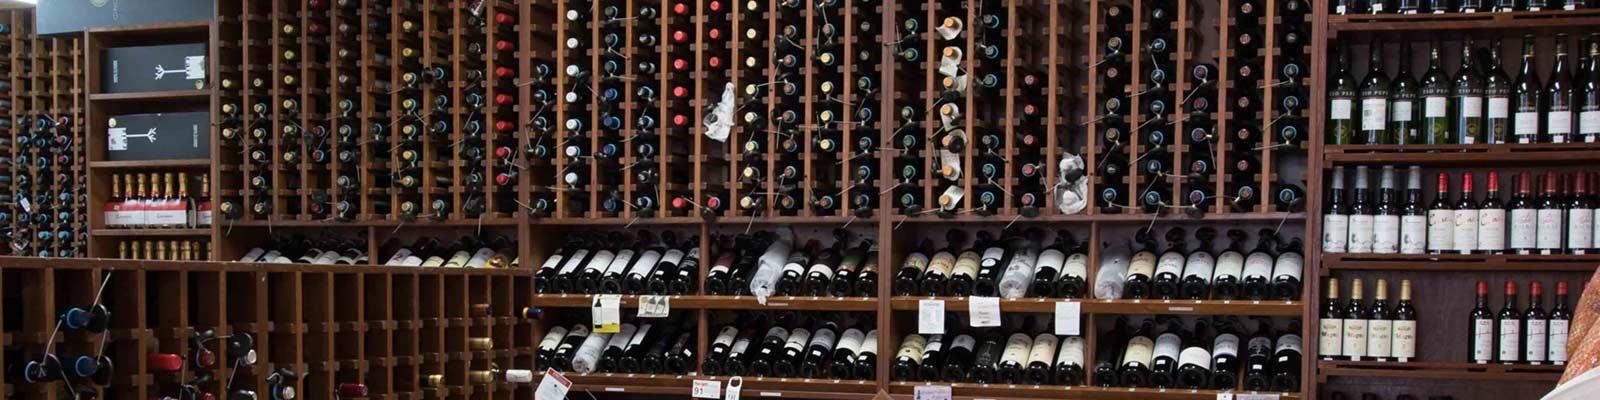 spanish-wine-page.jpg